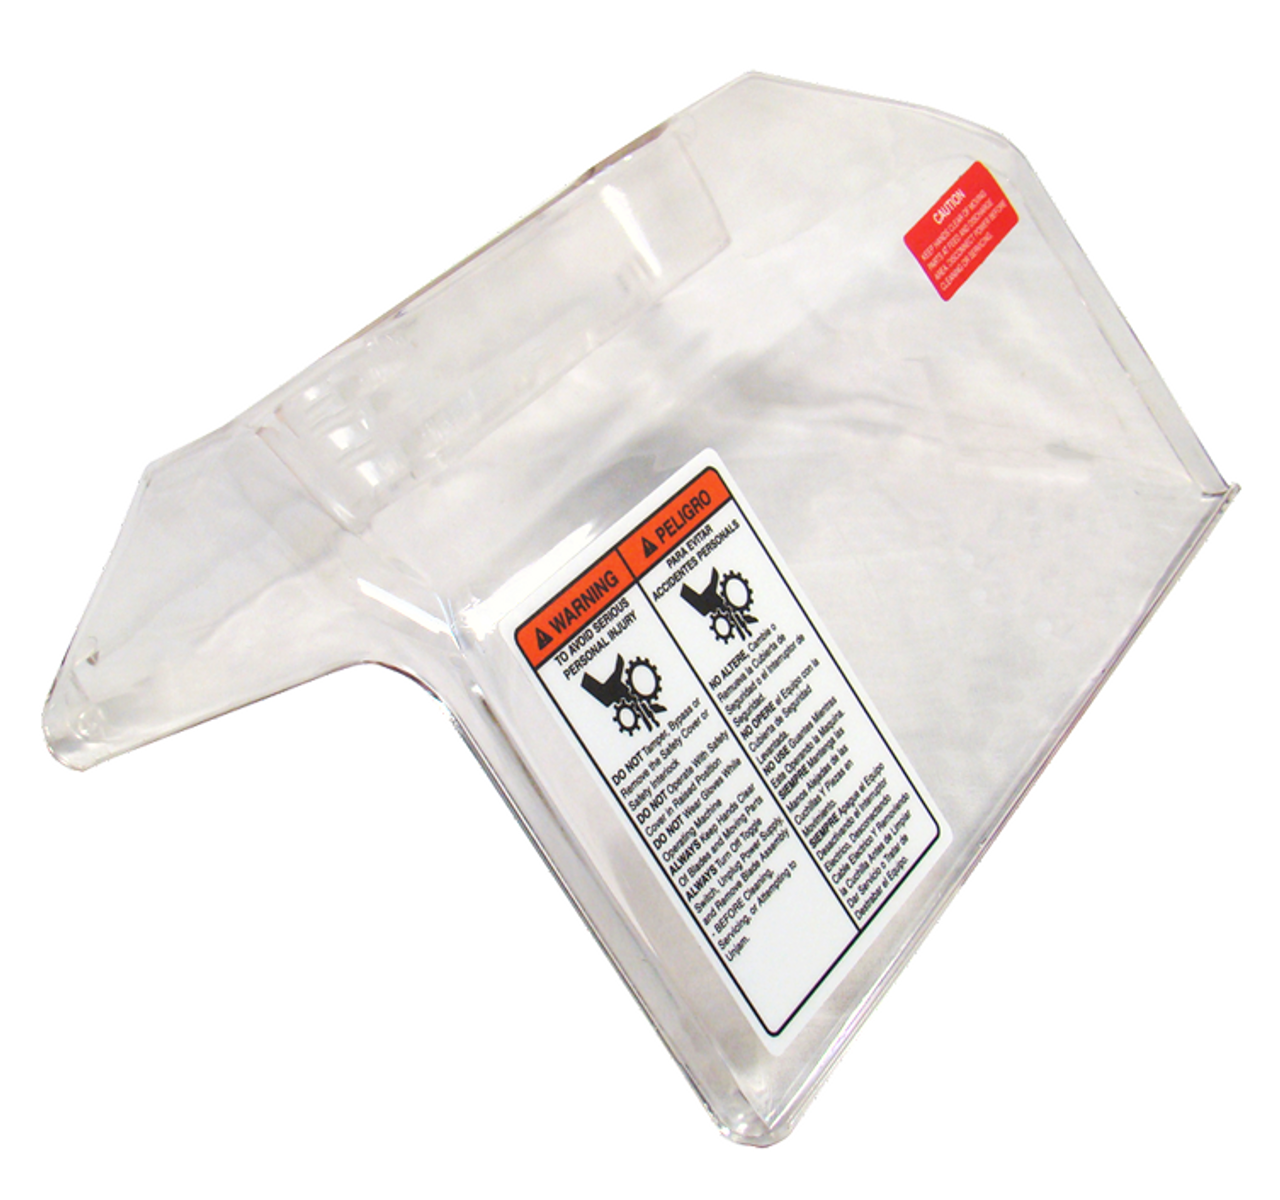 Biro Pro 9 - Biro Safety Cover - B326